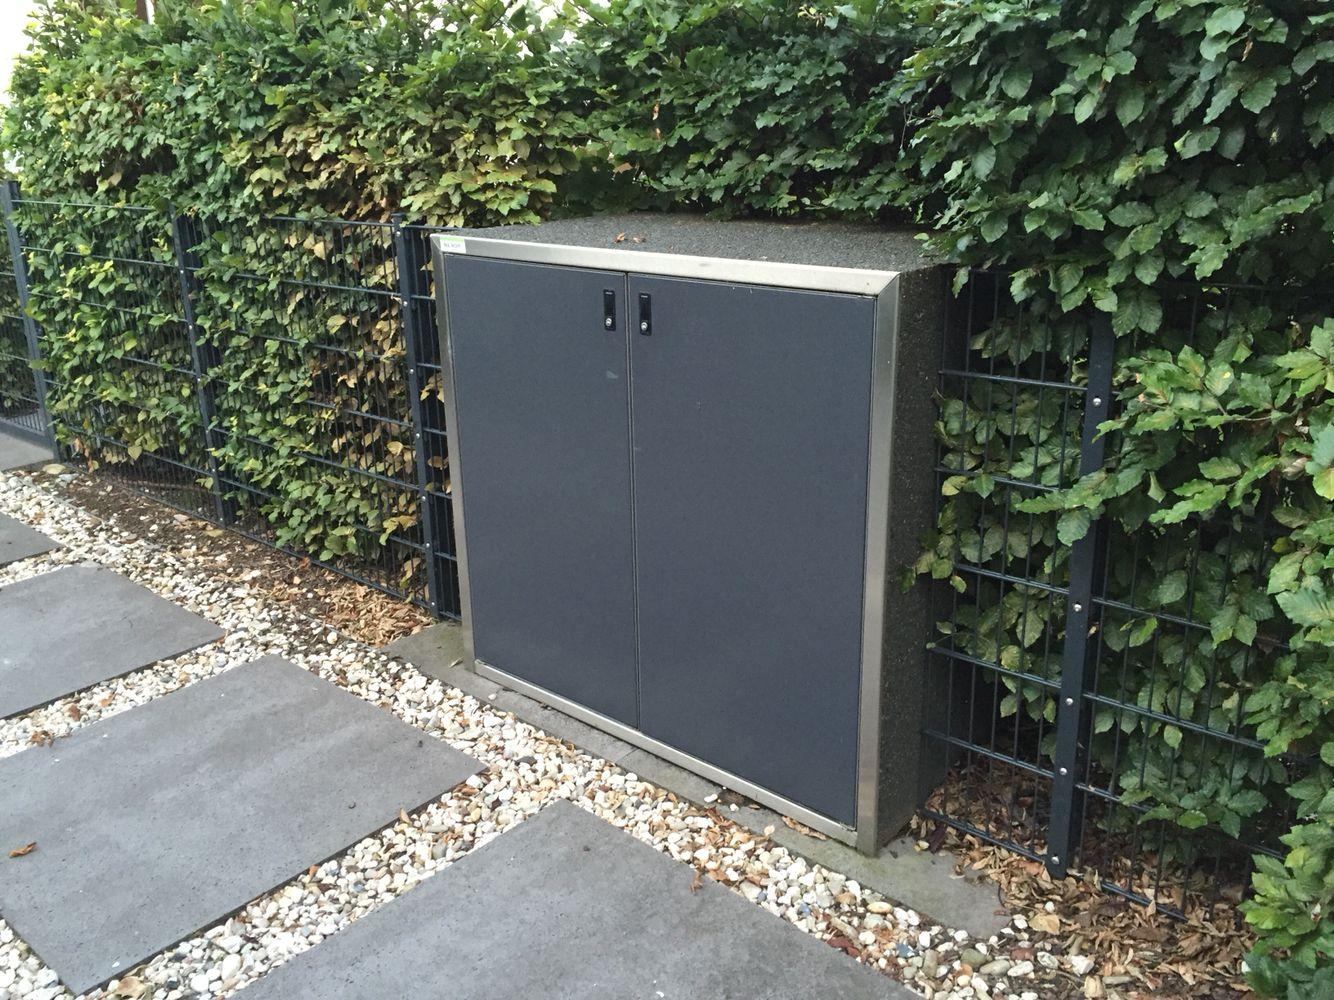 Türen Düsseldorf mülltonnenbox silent 243 türen anthrazit rahmen edelstahl korpus